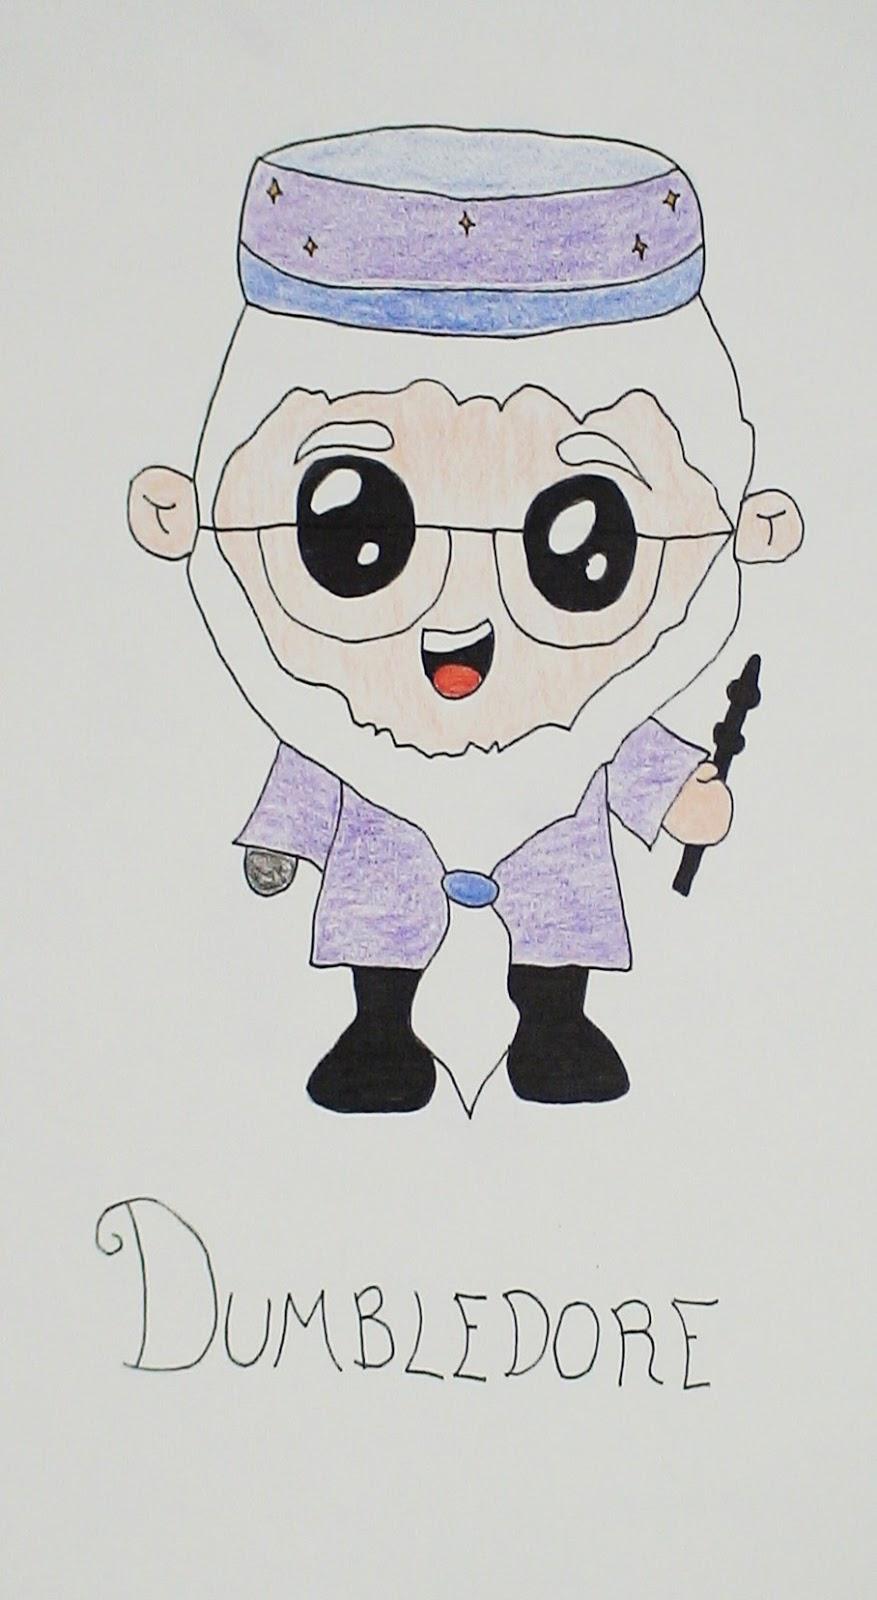 Dibujos Harry Potter 5 Rincón De Gryffindor